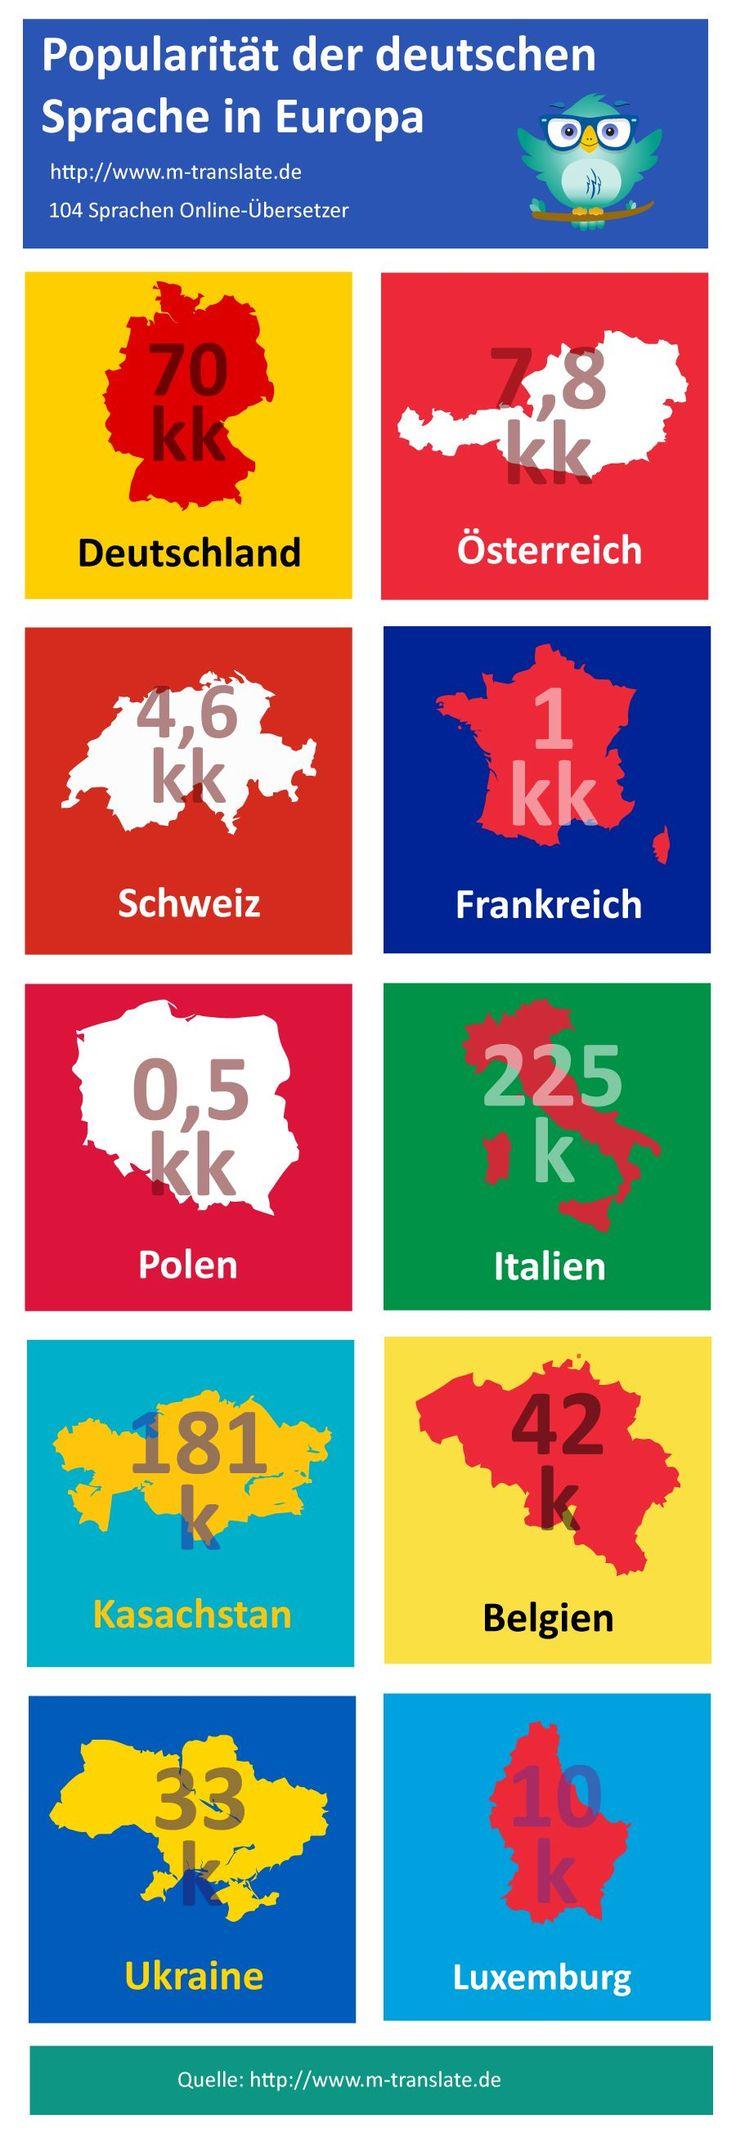 bester online übersetzer m-translate.de